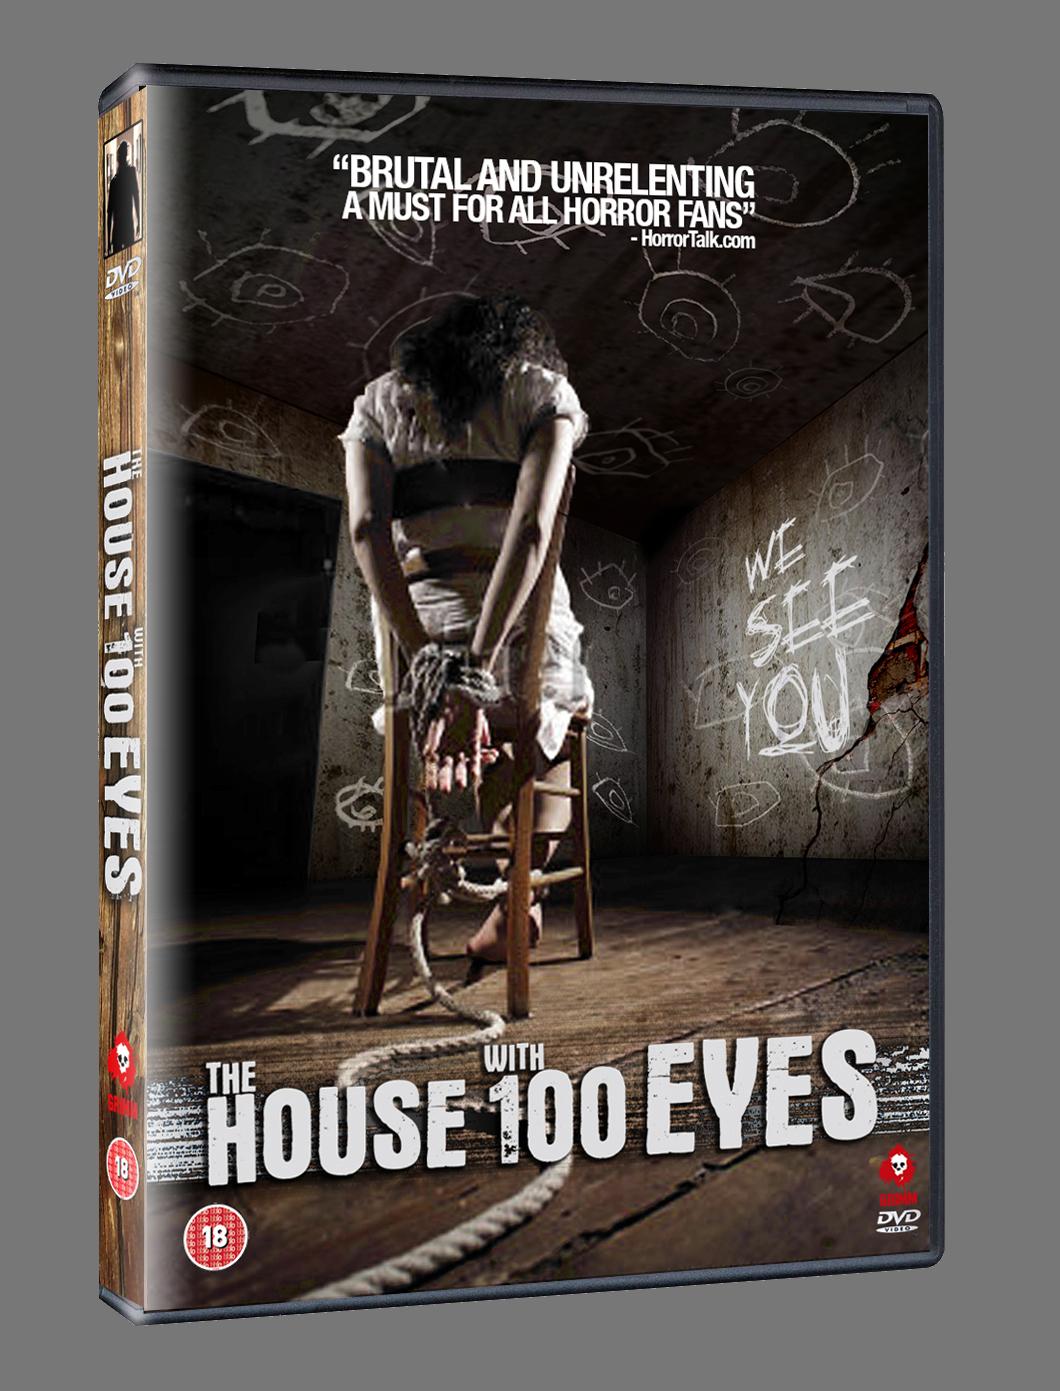 House of 100 Eyes DVD Mockup